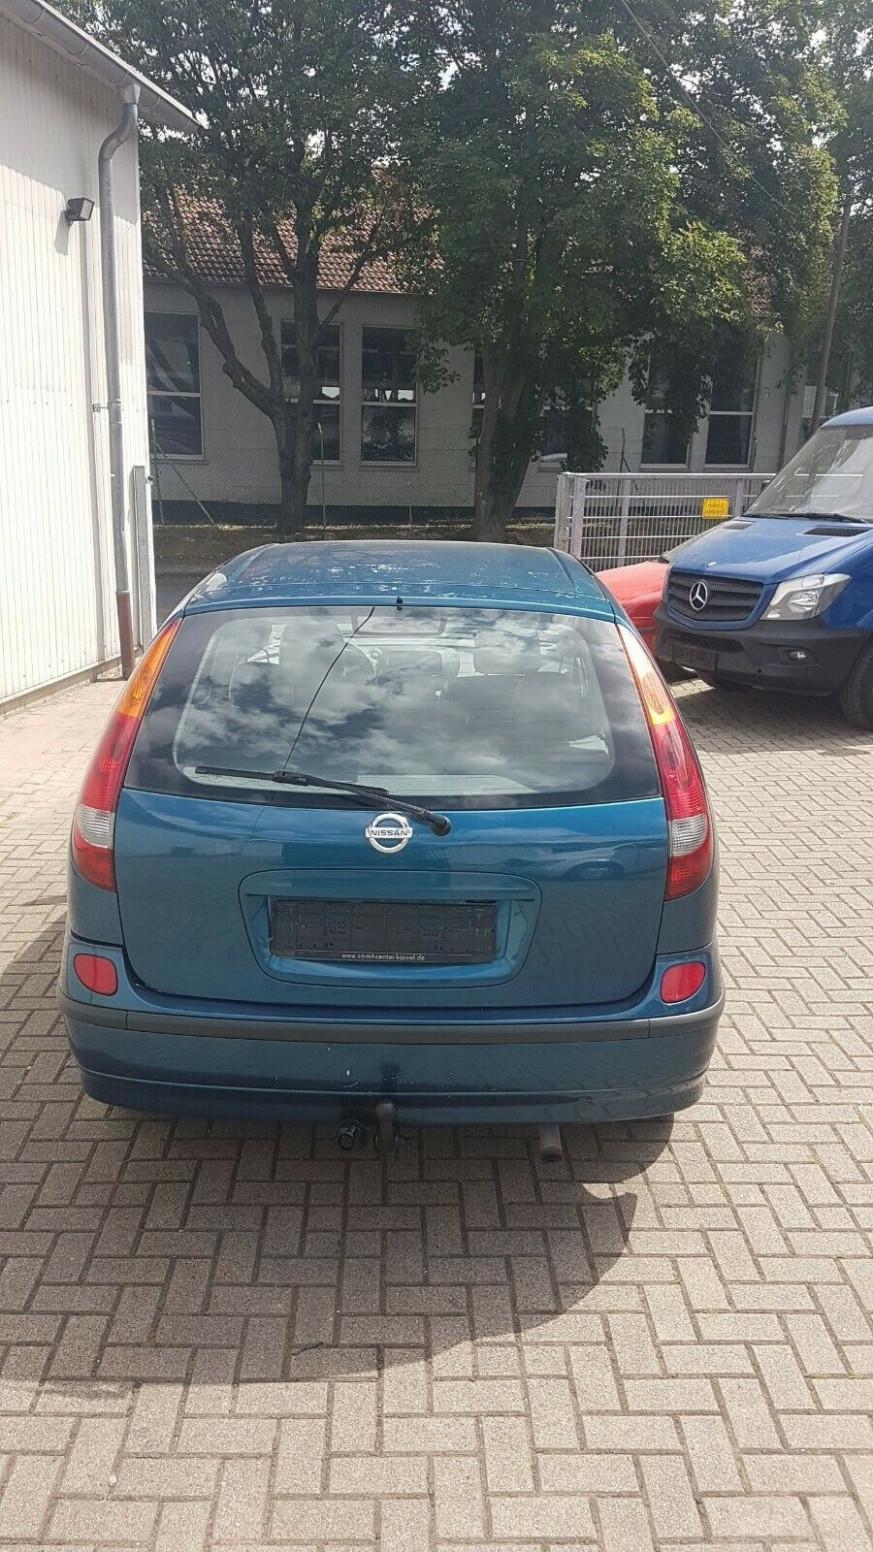 Release Nissan Almera 2022